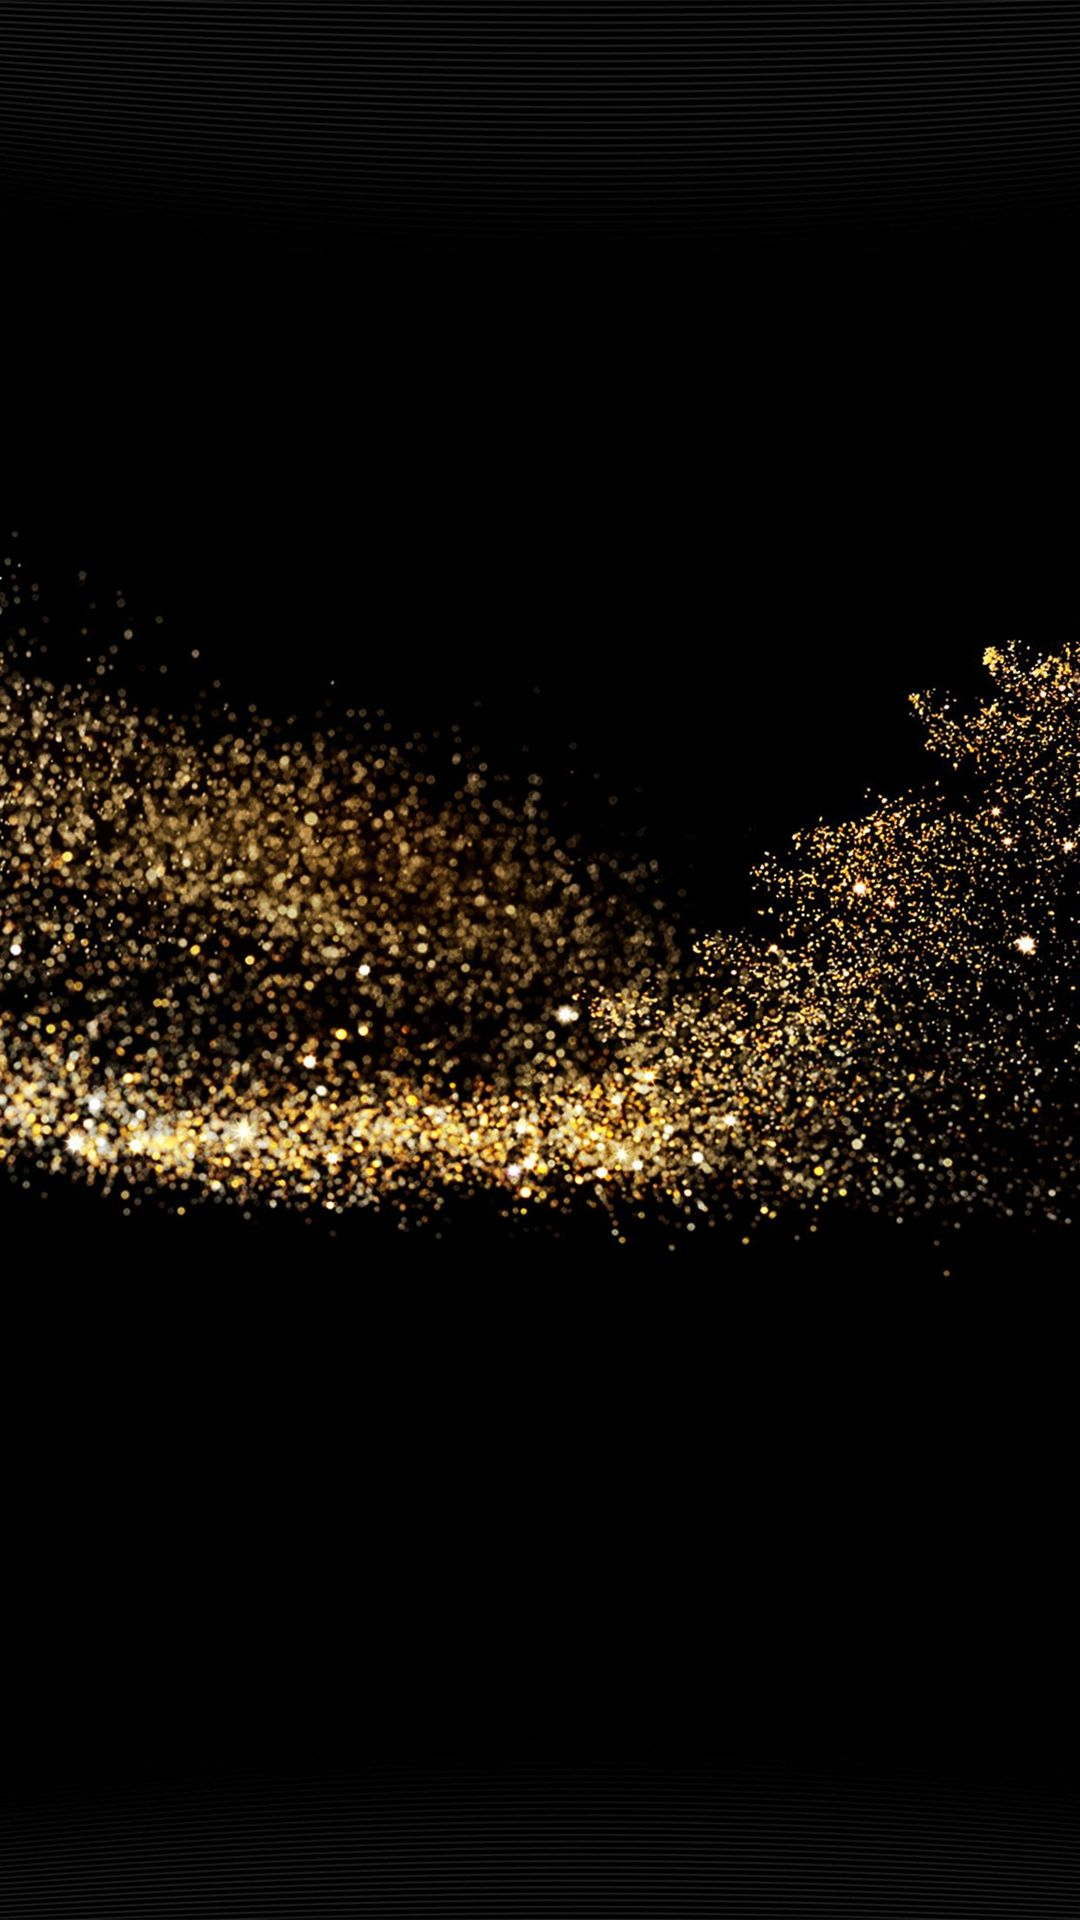 Gold Sparkle Beauty Dark Pattern Iphone 6 Wallpaper Download Iphone Wallpapers Ipad Wallpap Gold Wallpaper Iphone Sparkle Wallpaper Gold And Black Wallpaper